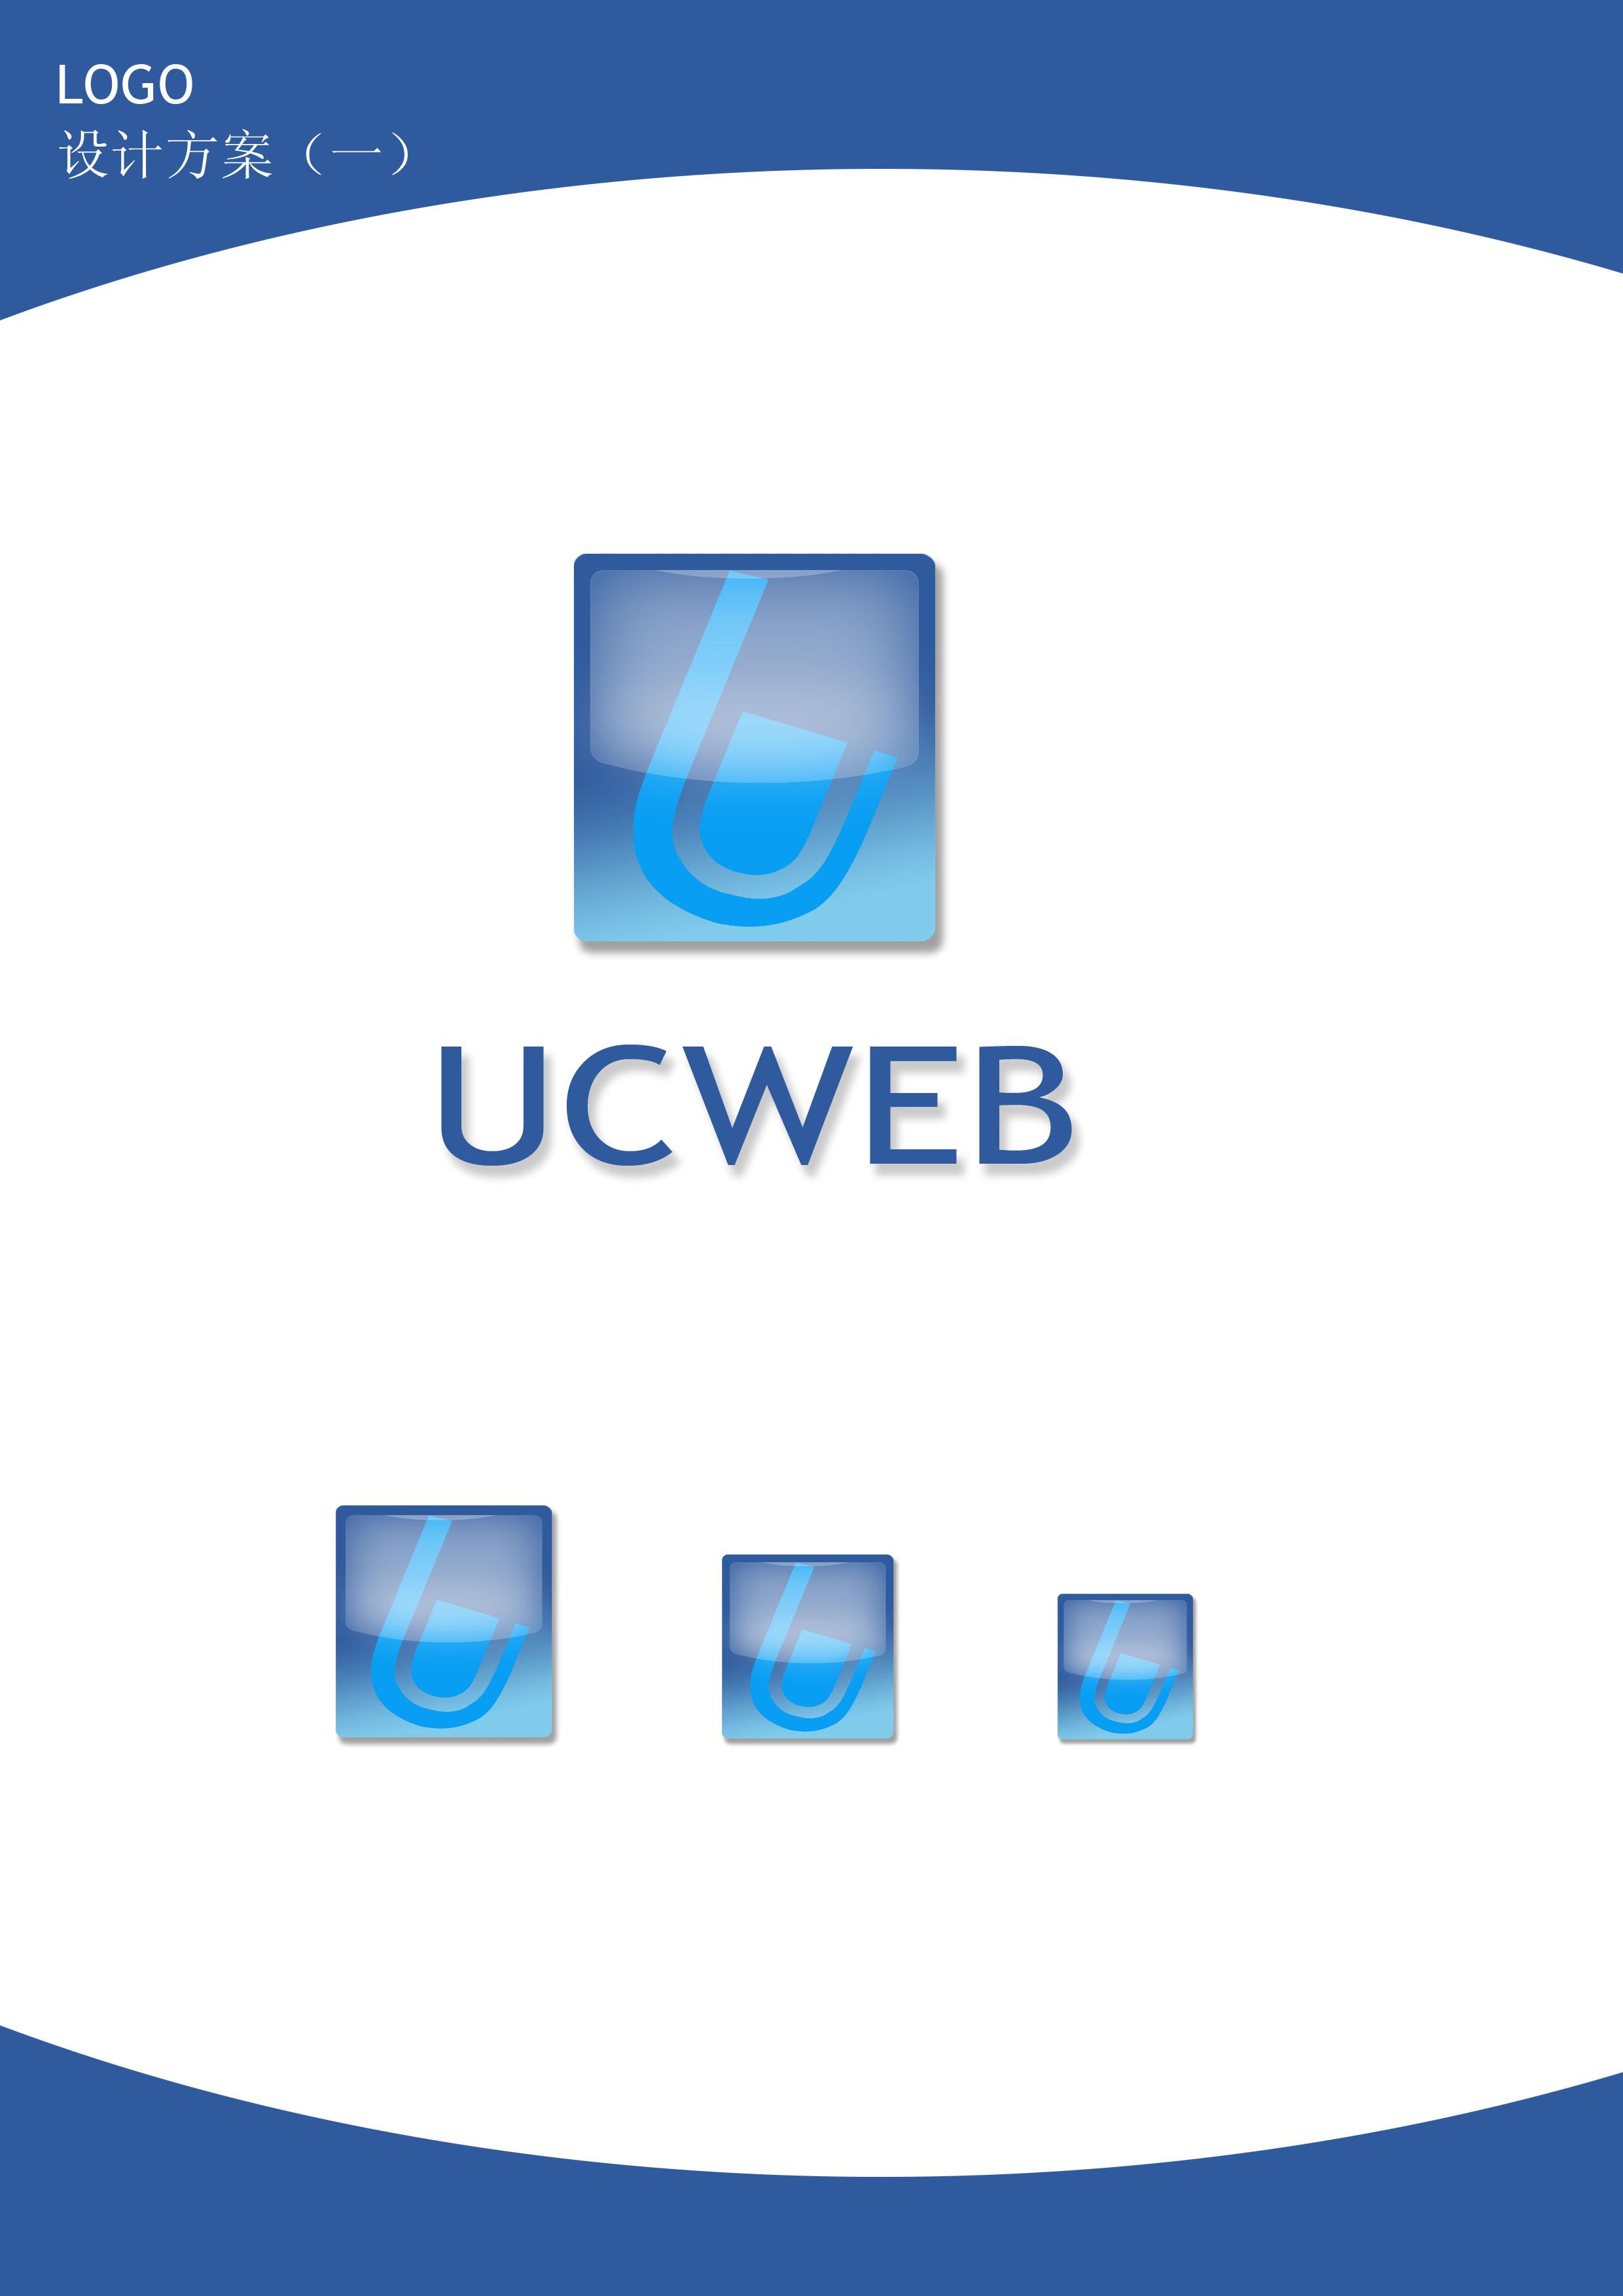 ucweb手机软件logo设计